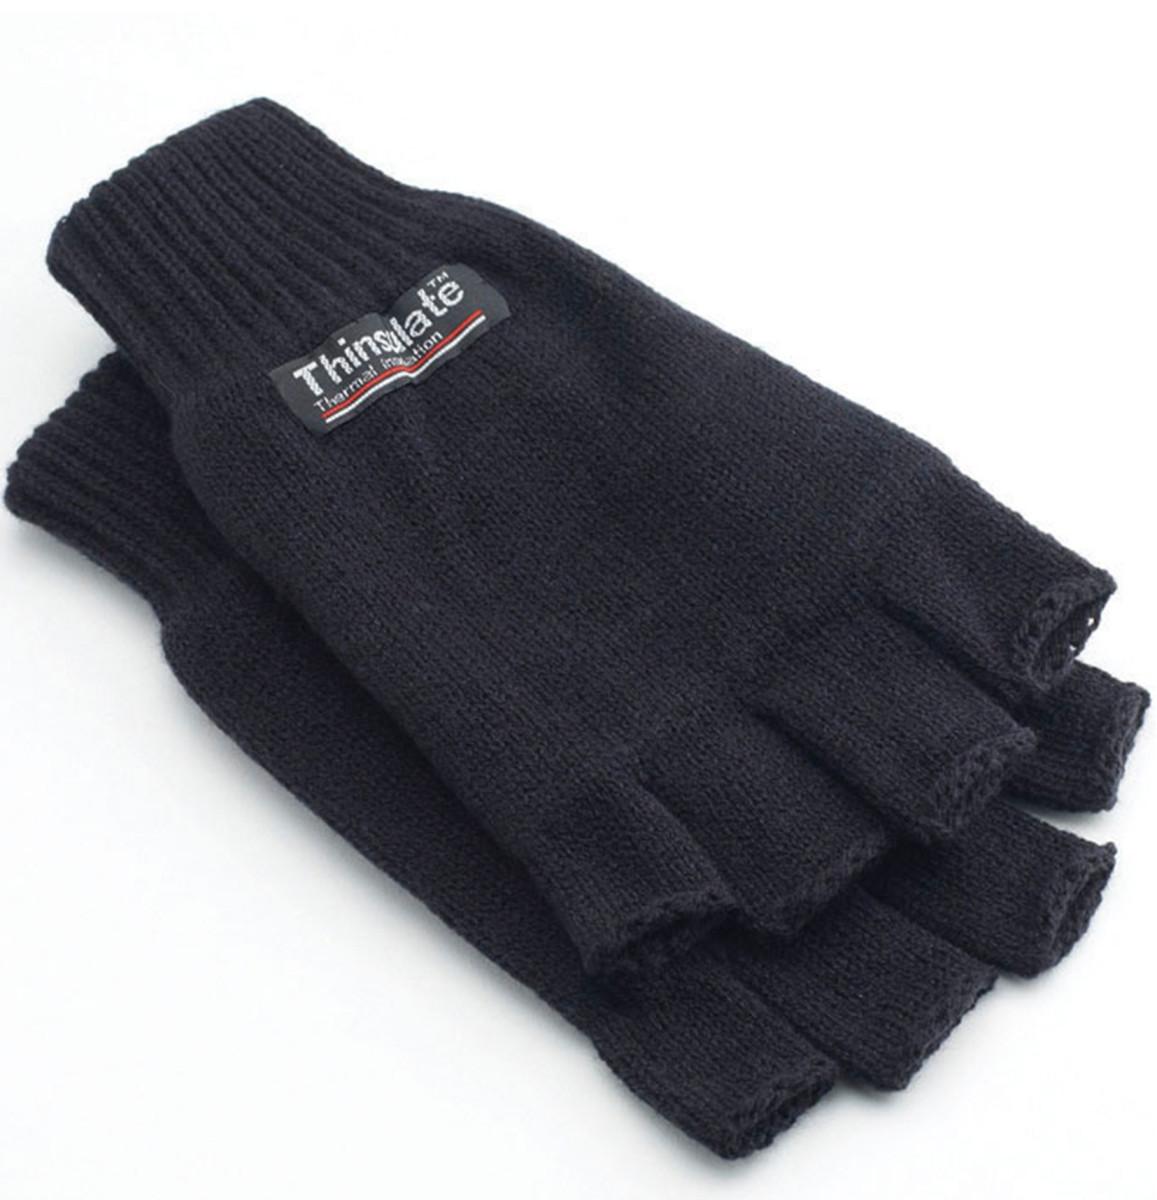 3M Thinsulate Half Finger Gloves